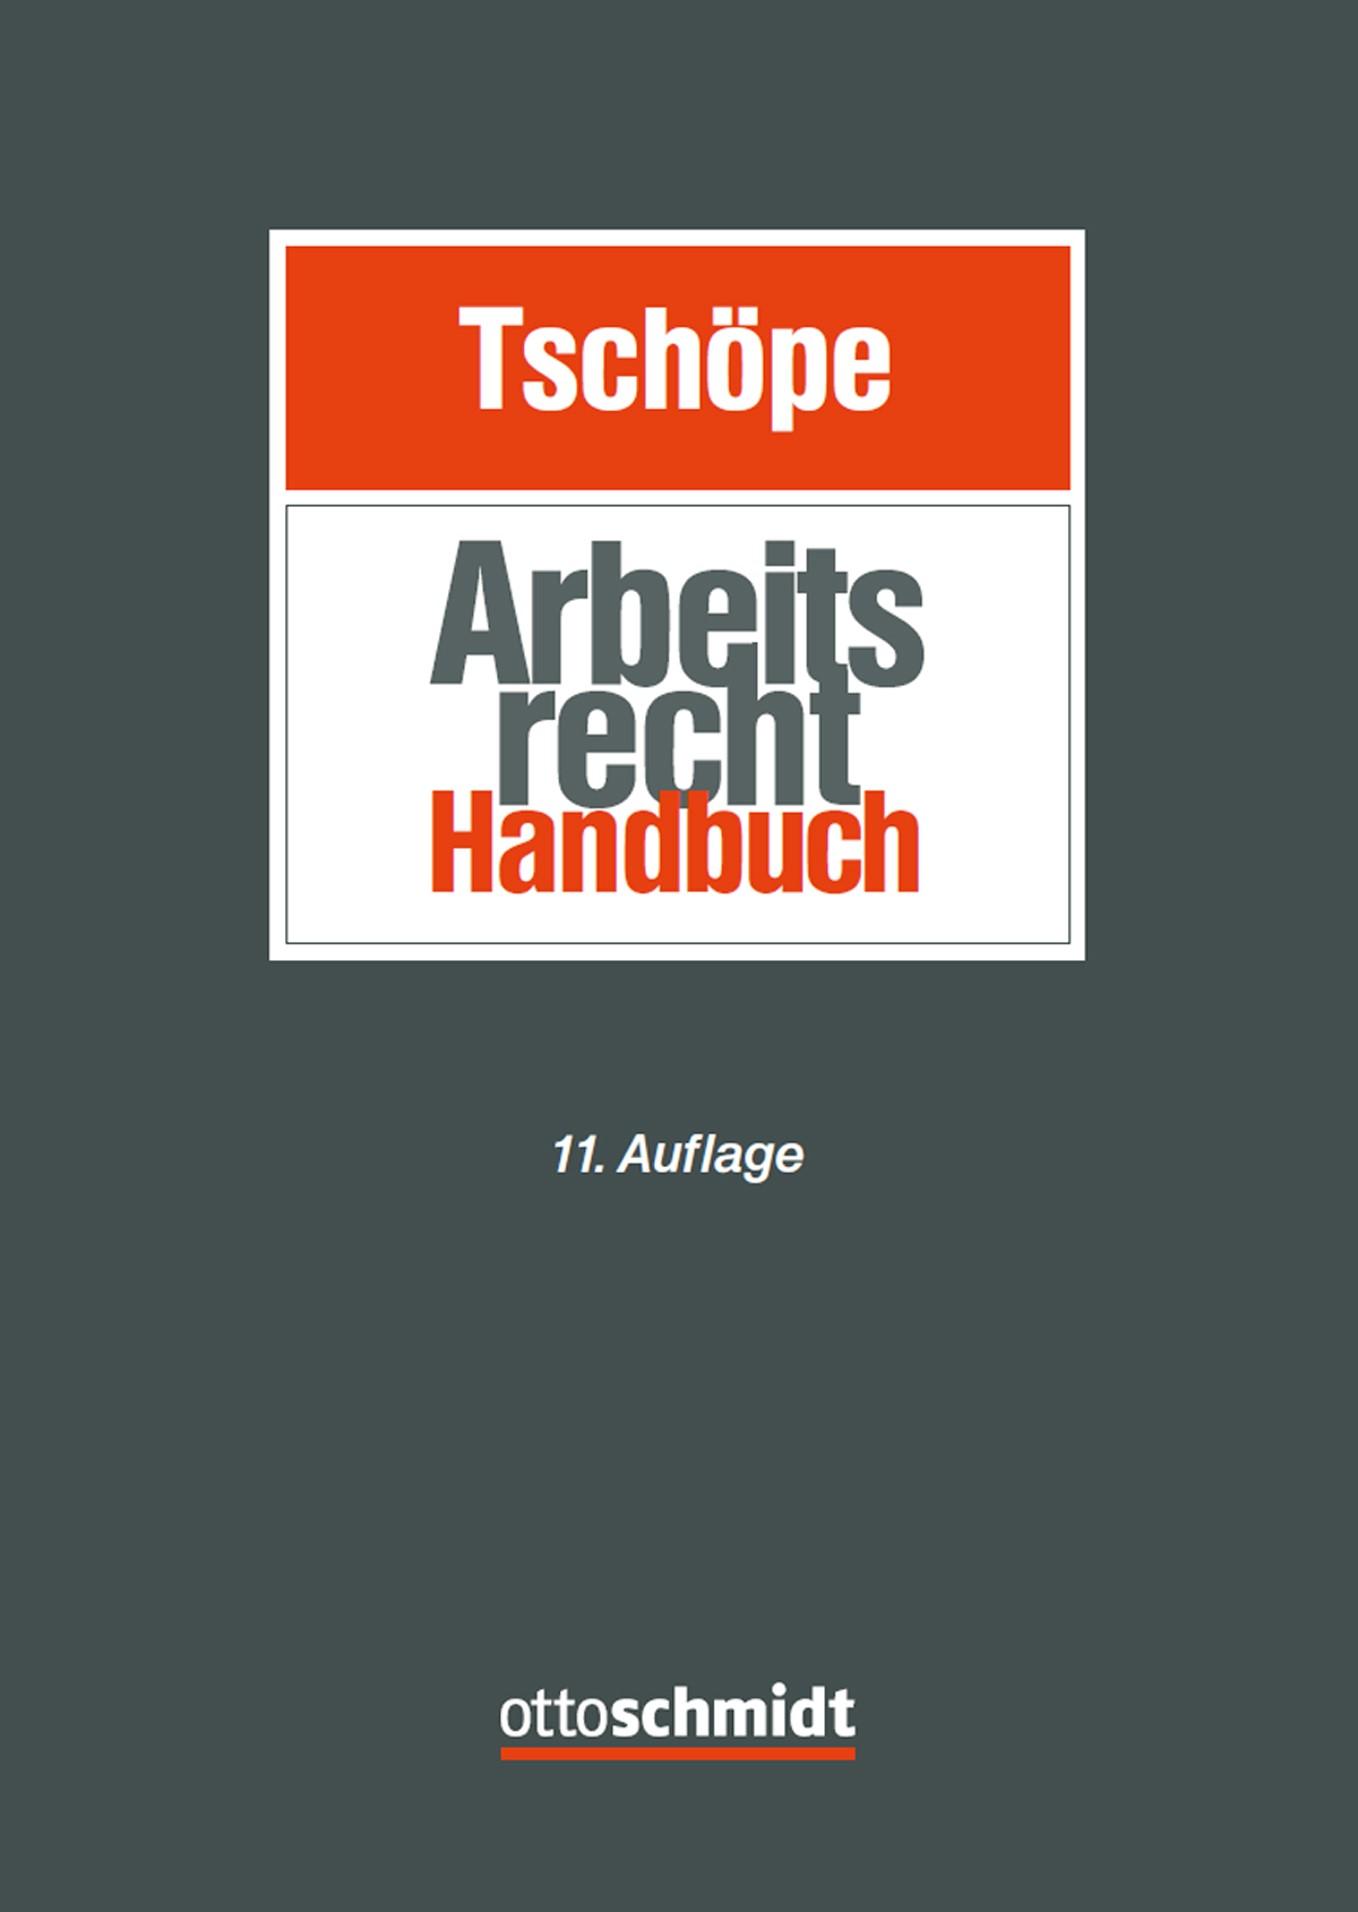 Arbeitsrecht Handbuch   Tschöpe (Hrsg.)   11., neu bearbeitete Auflage, 2019   Buch (Cover)